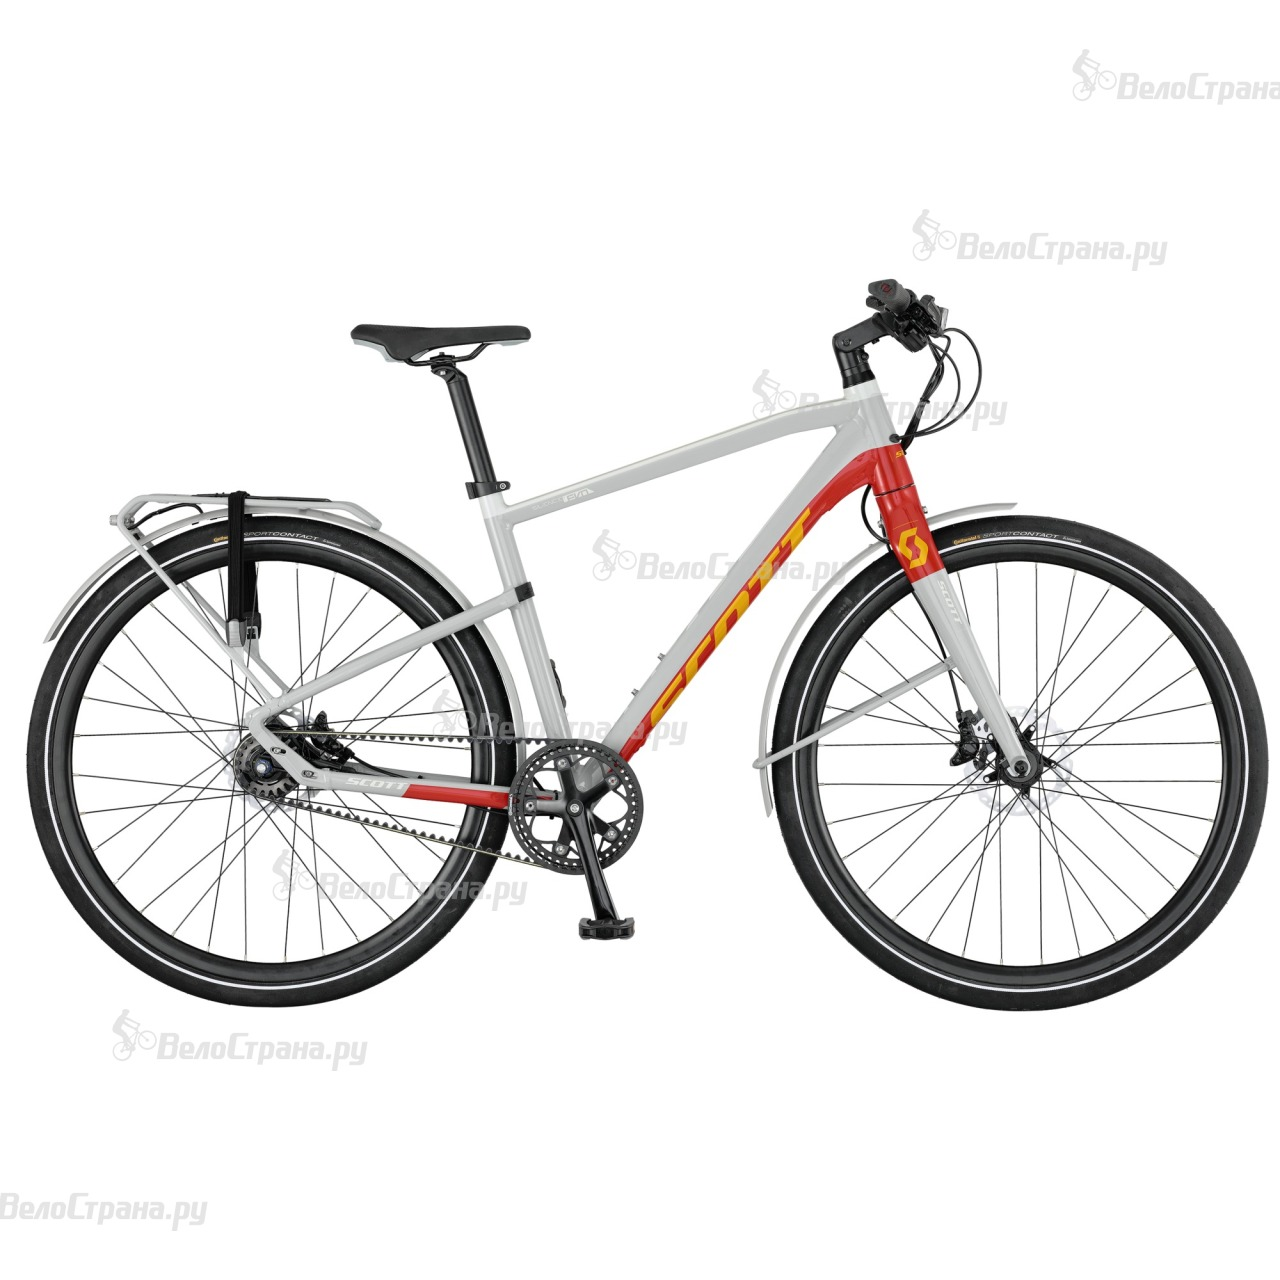 Велосипед Scott Silence Evo (2017) велосипед scott e silence evo 2017